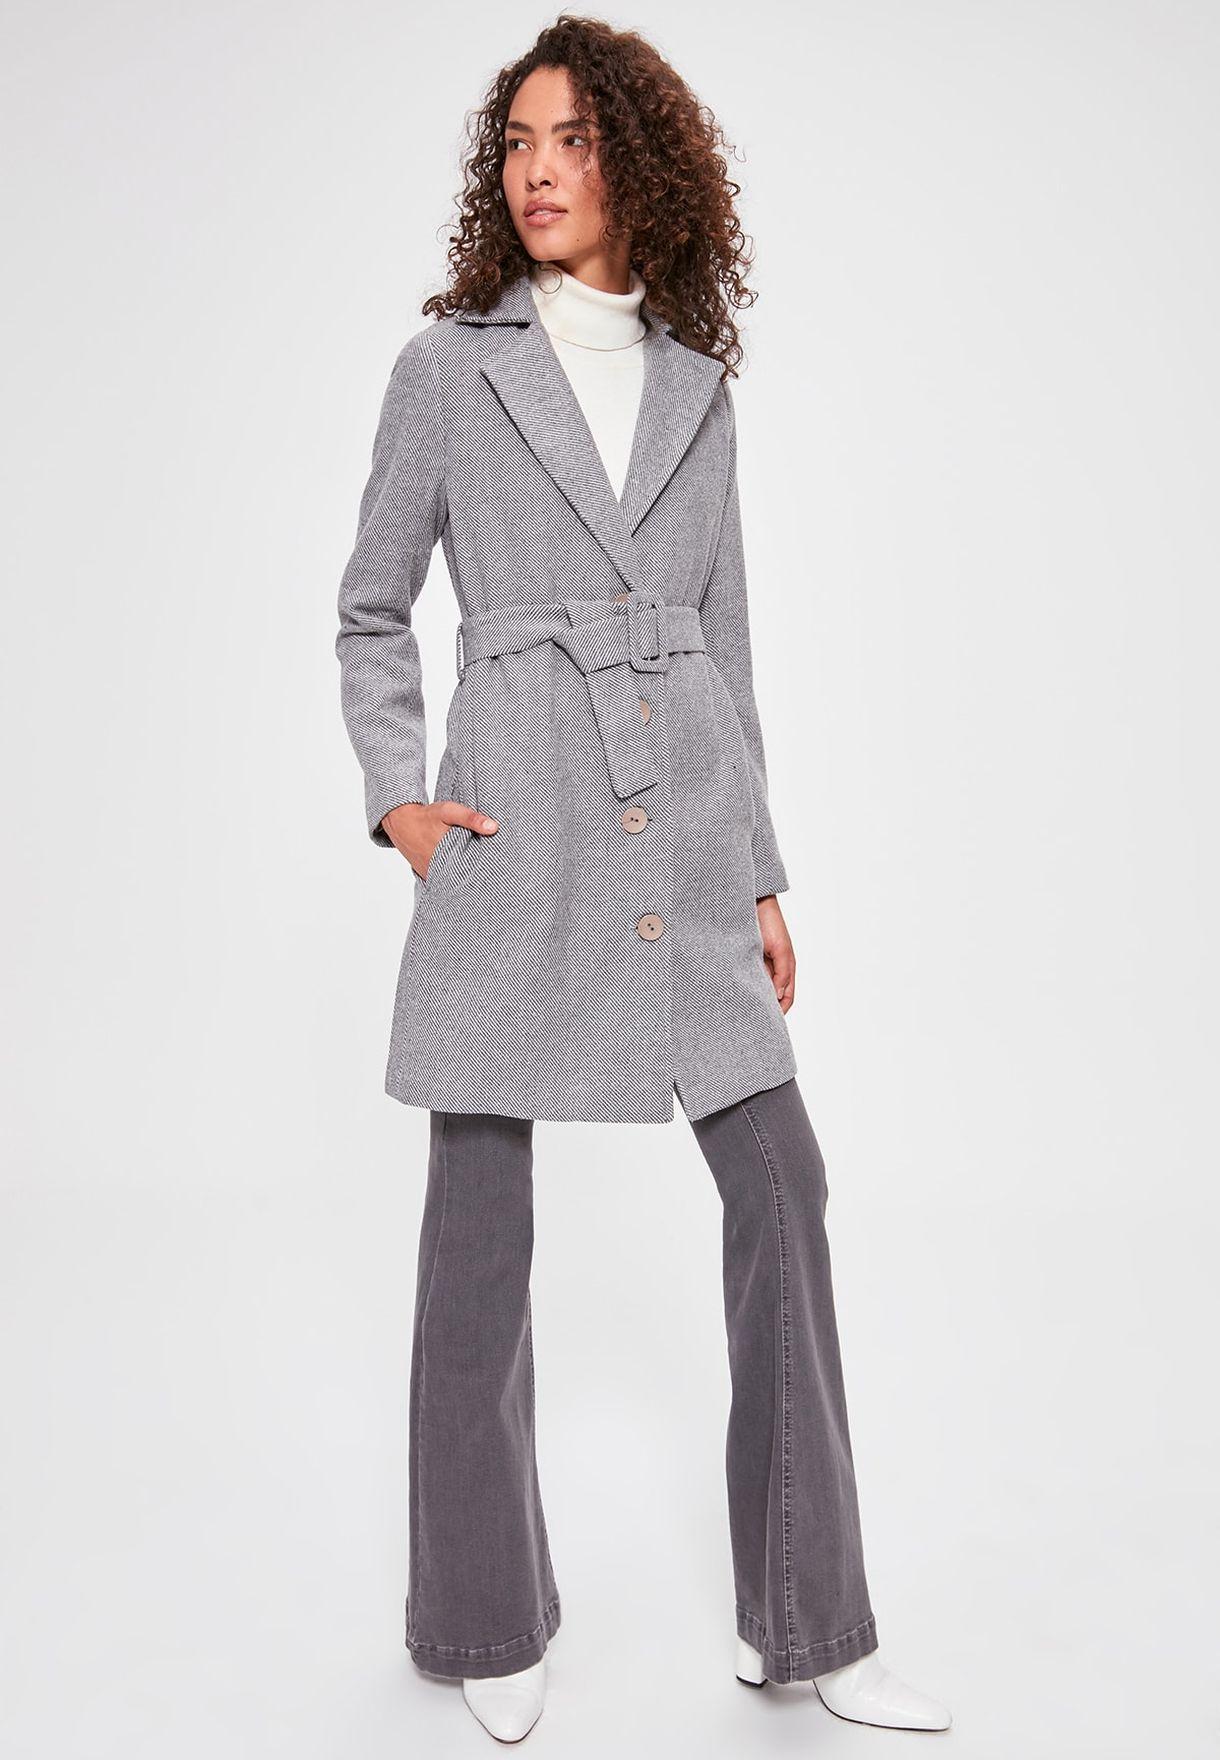 معطف مخطط بأزرار